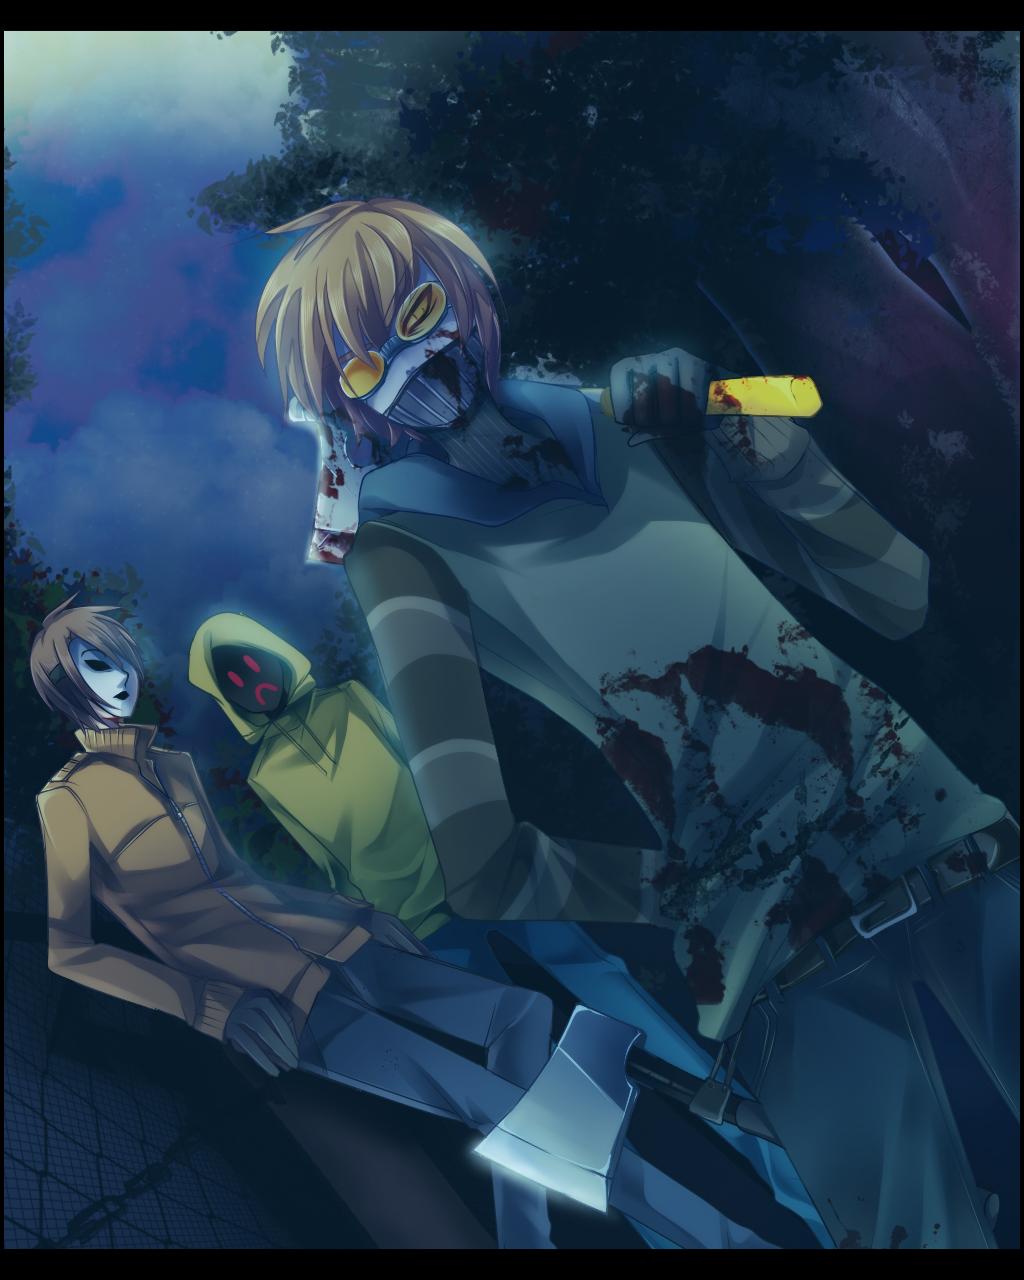 Creepypasta zerochan anime image board for Zerochan anime